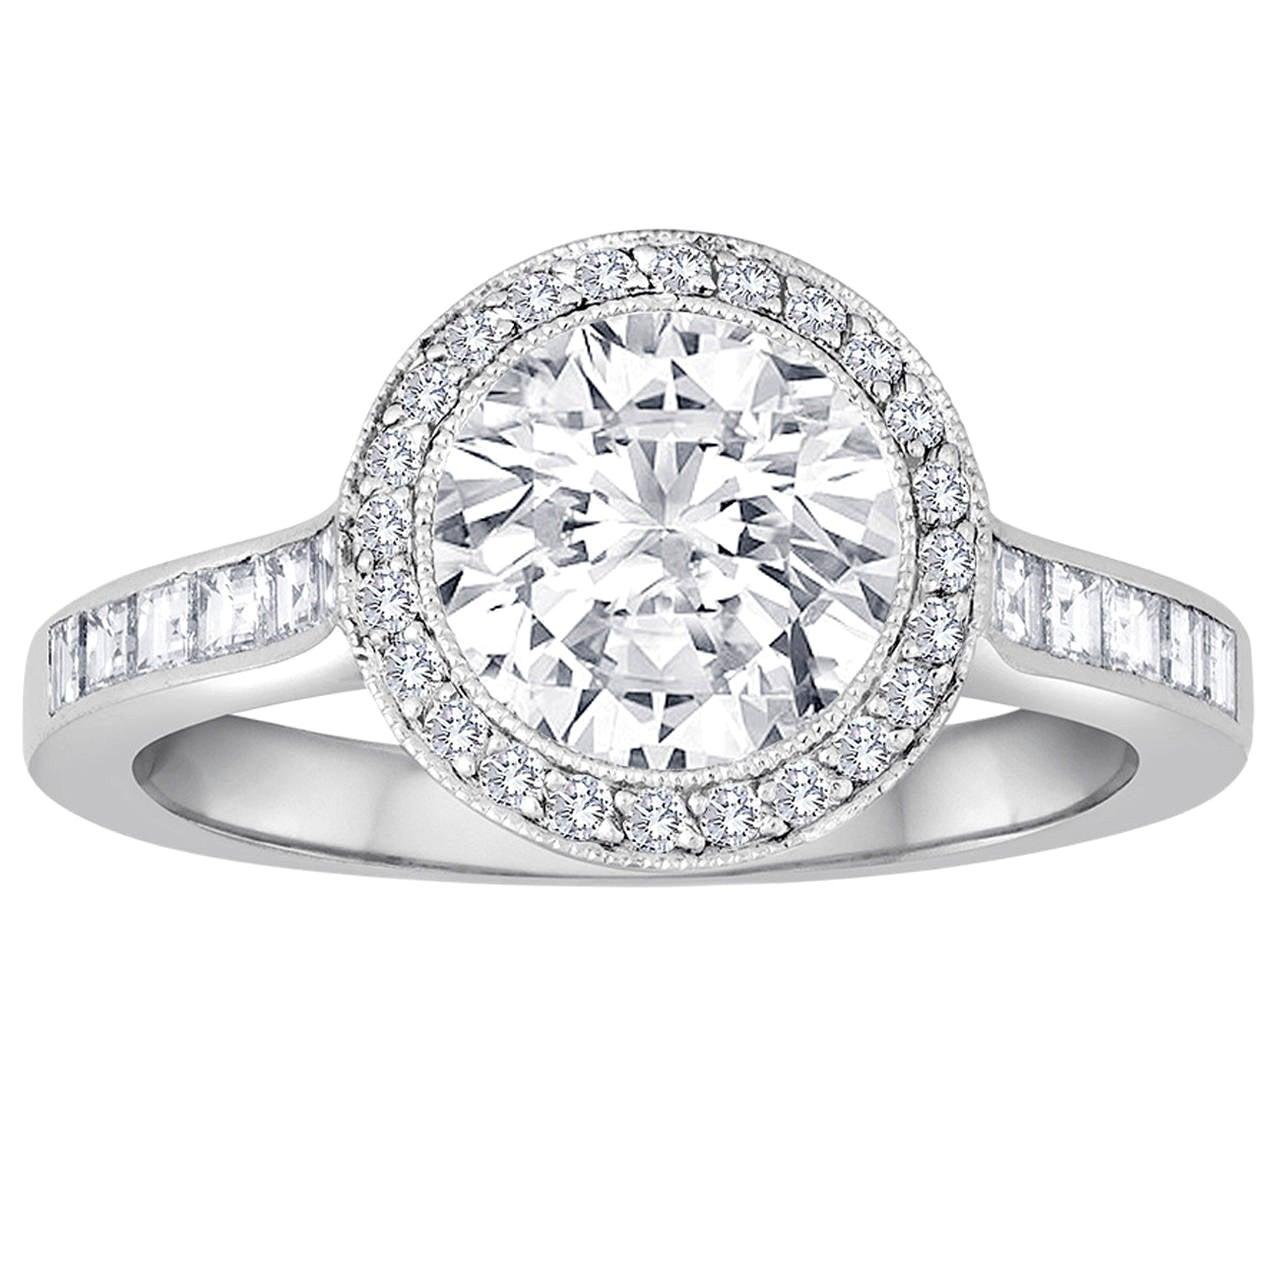 Tiffany & Co. 1.67 Carat F VVS2 Diamond Platinum Ring